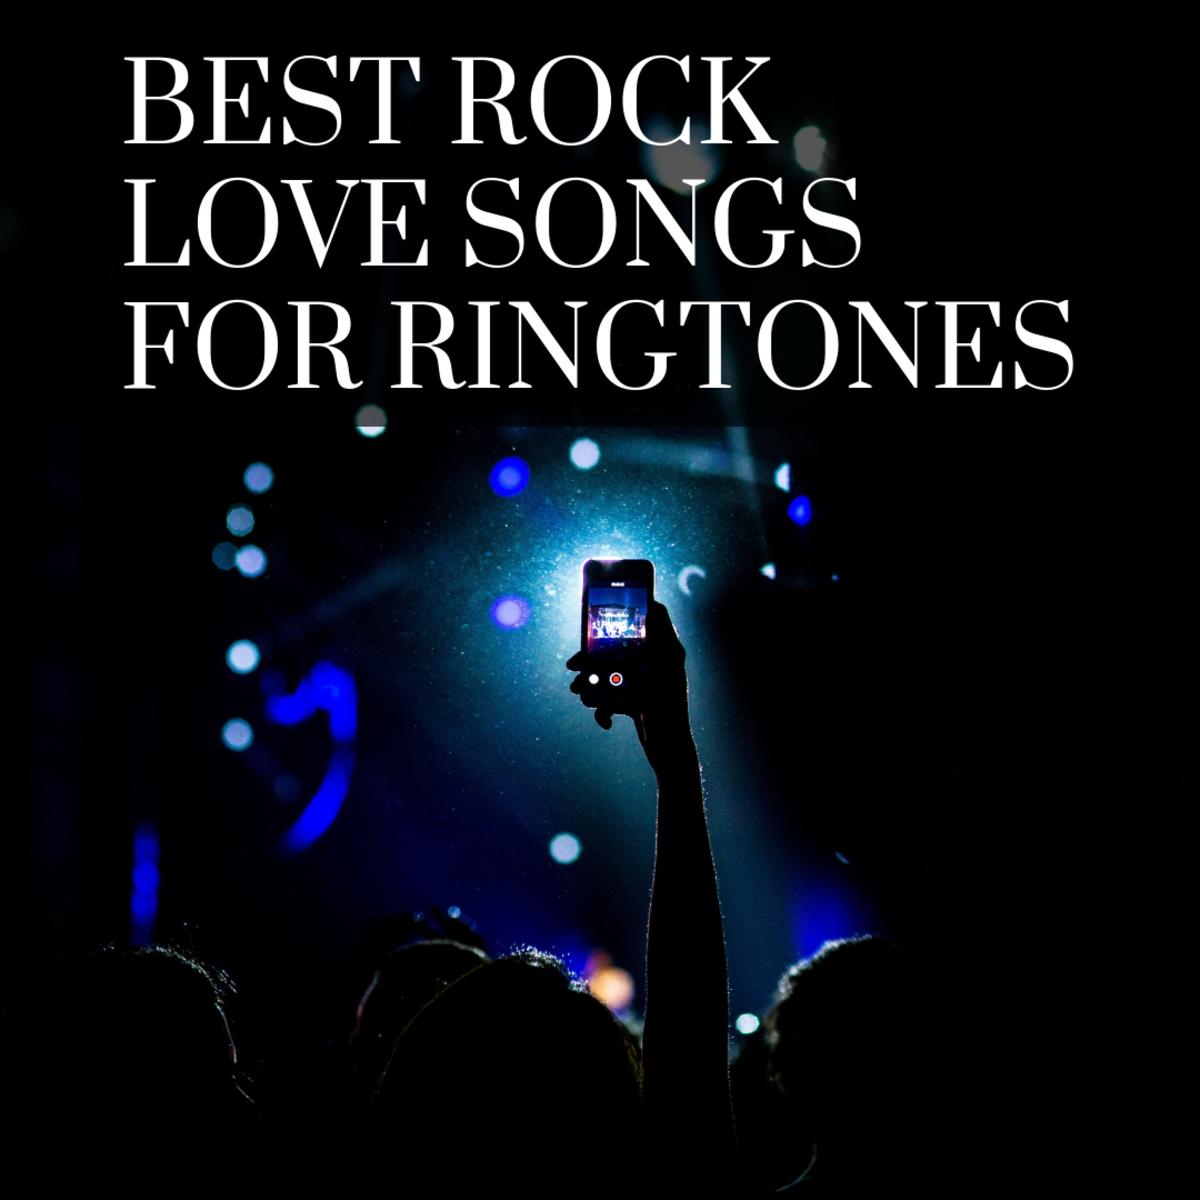 100 Best Rock Love Songs for Ringtones